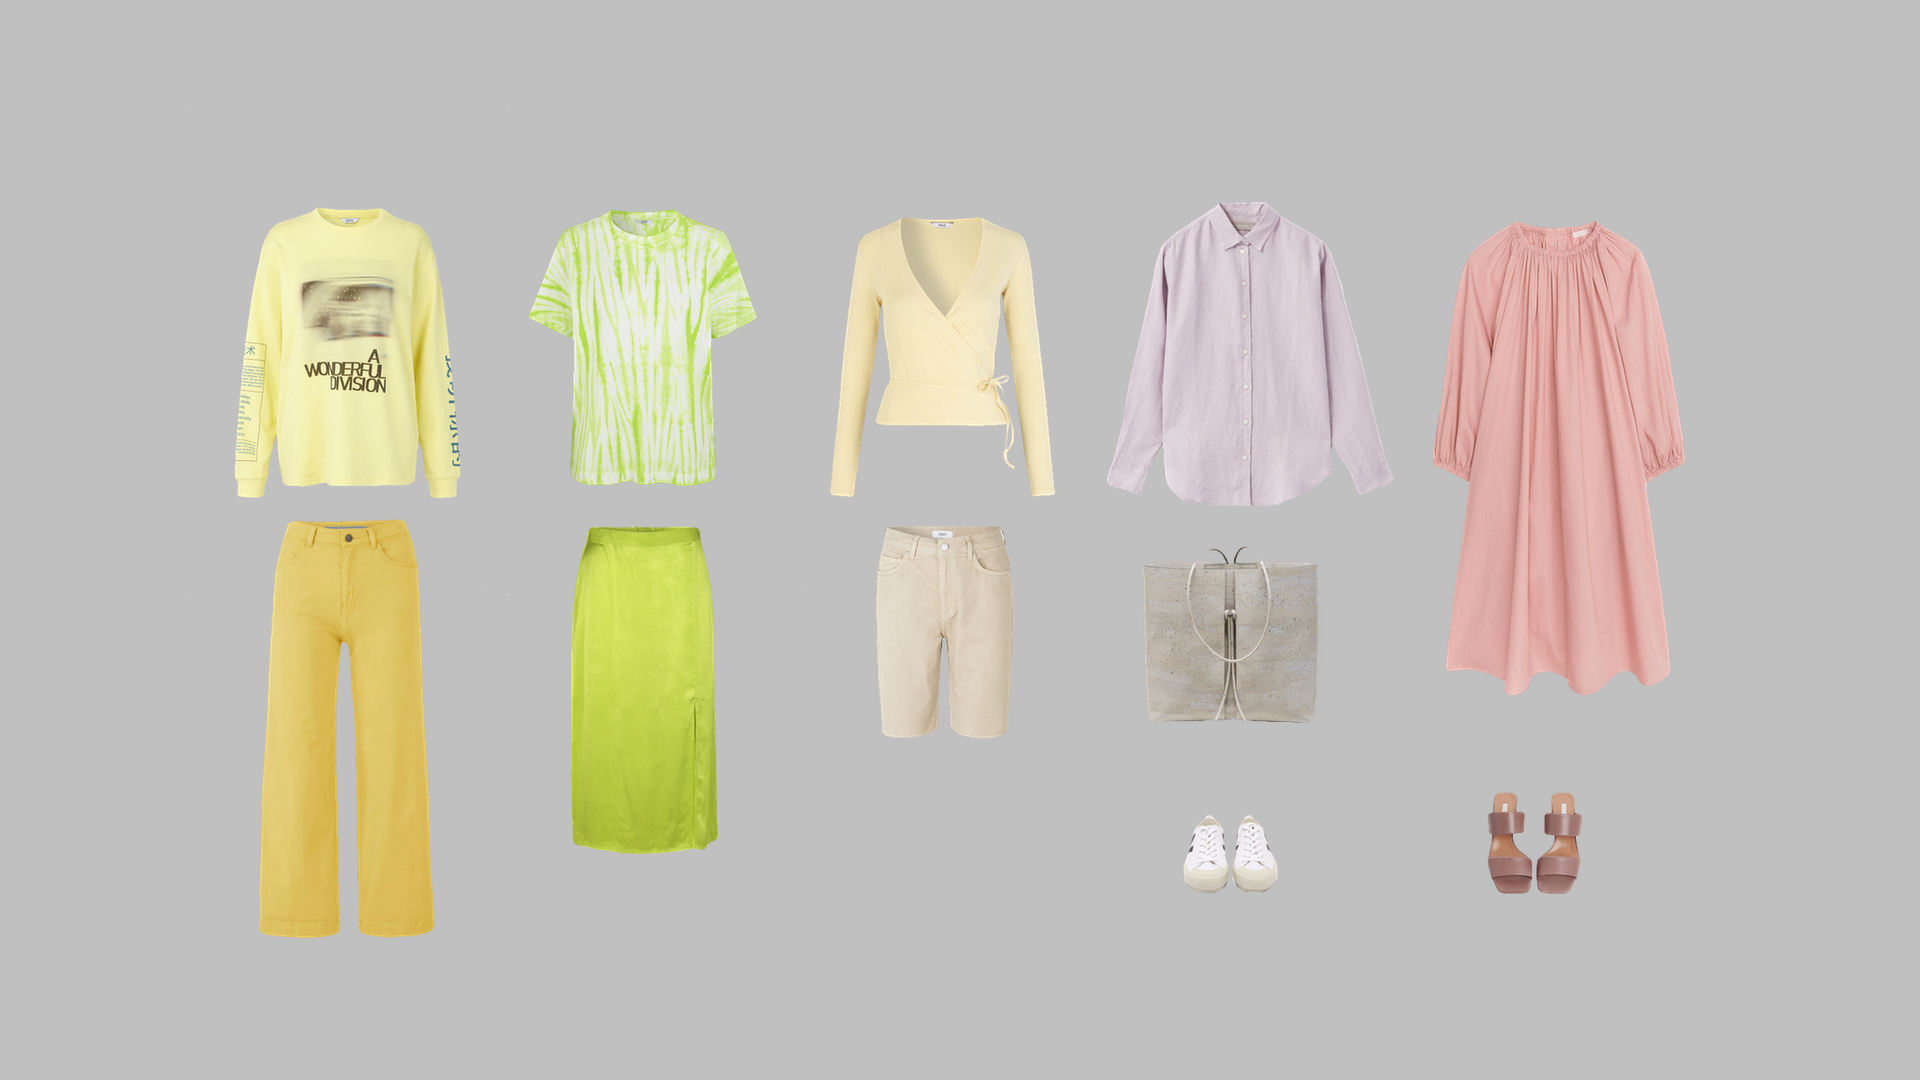 Yellow sweatshirt ,  Green t-shirt ,  Yellow cardigan ,  Lilac shirt ,  Dress ,  Yellow jeans ,  Green skirt ,  Grey shorts ,  Bag ,  Sneakers ,  Sandals .